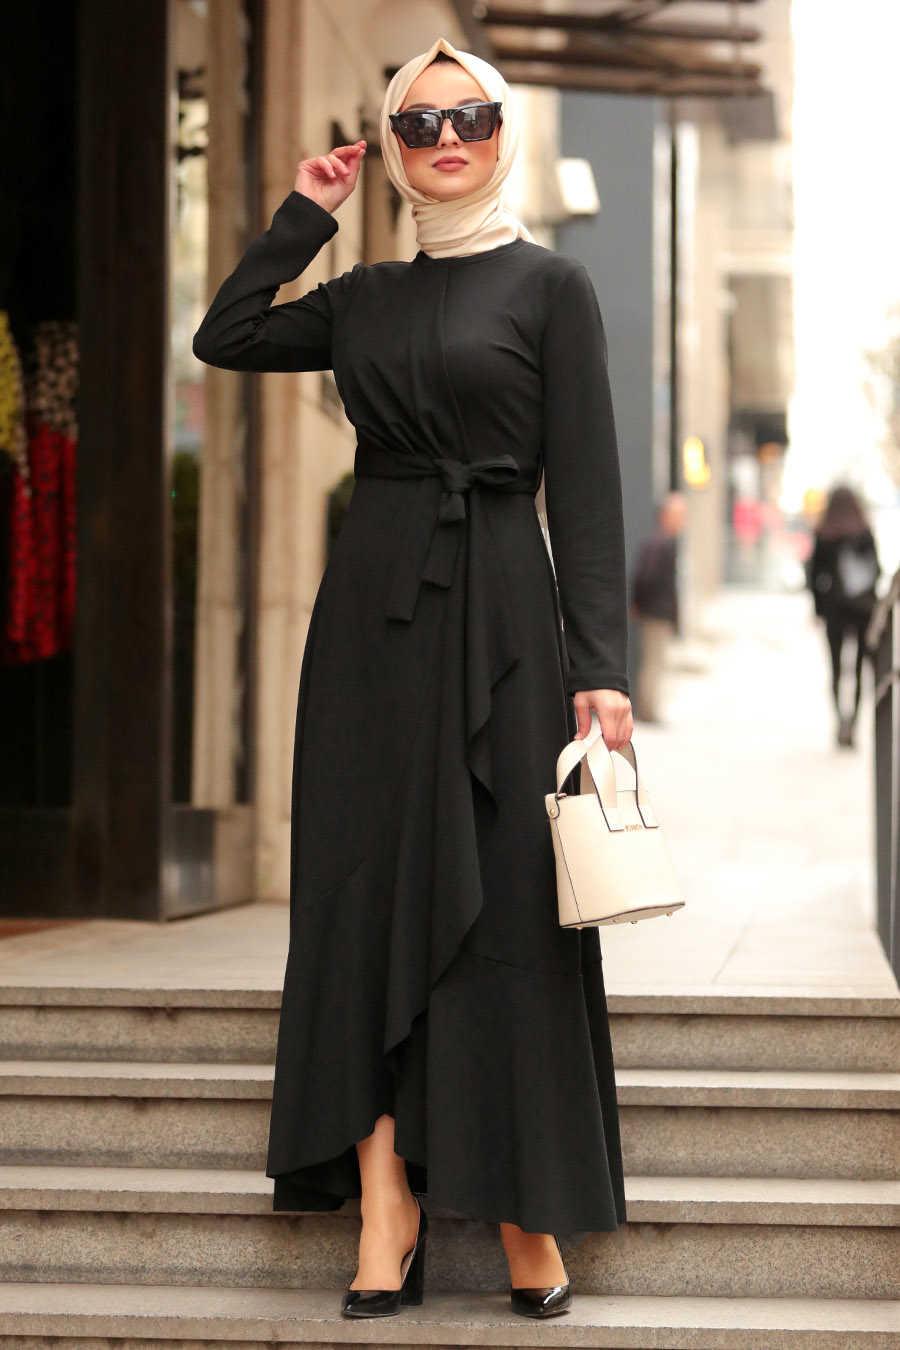 Neva Style - Black Hijab Dress 4041S